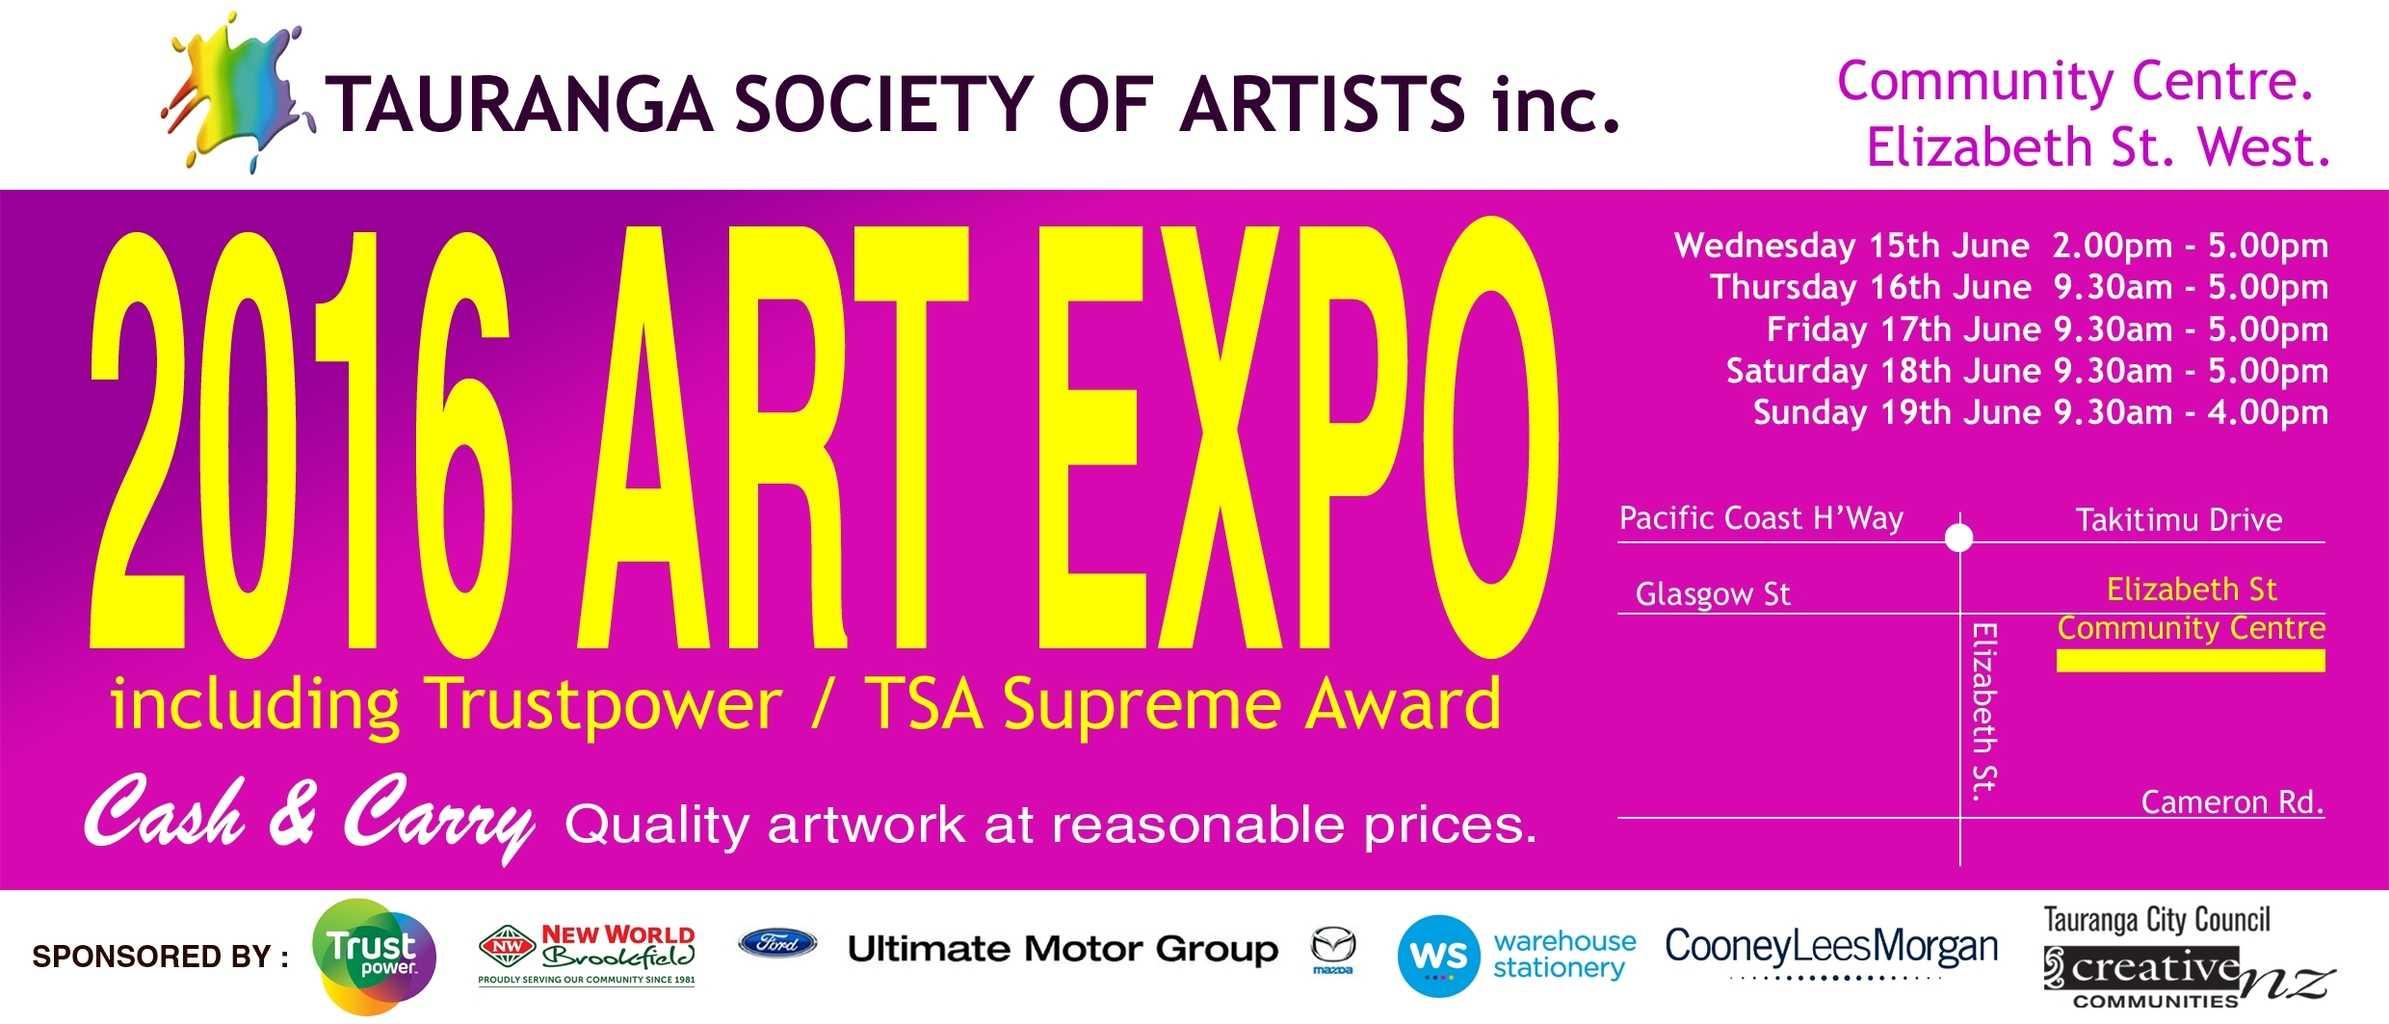 Another fabulous cash & carry art sale